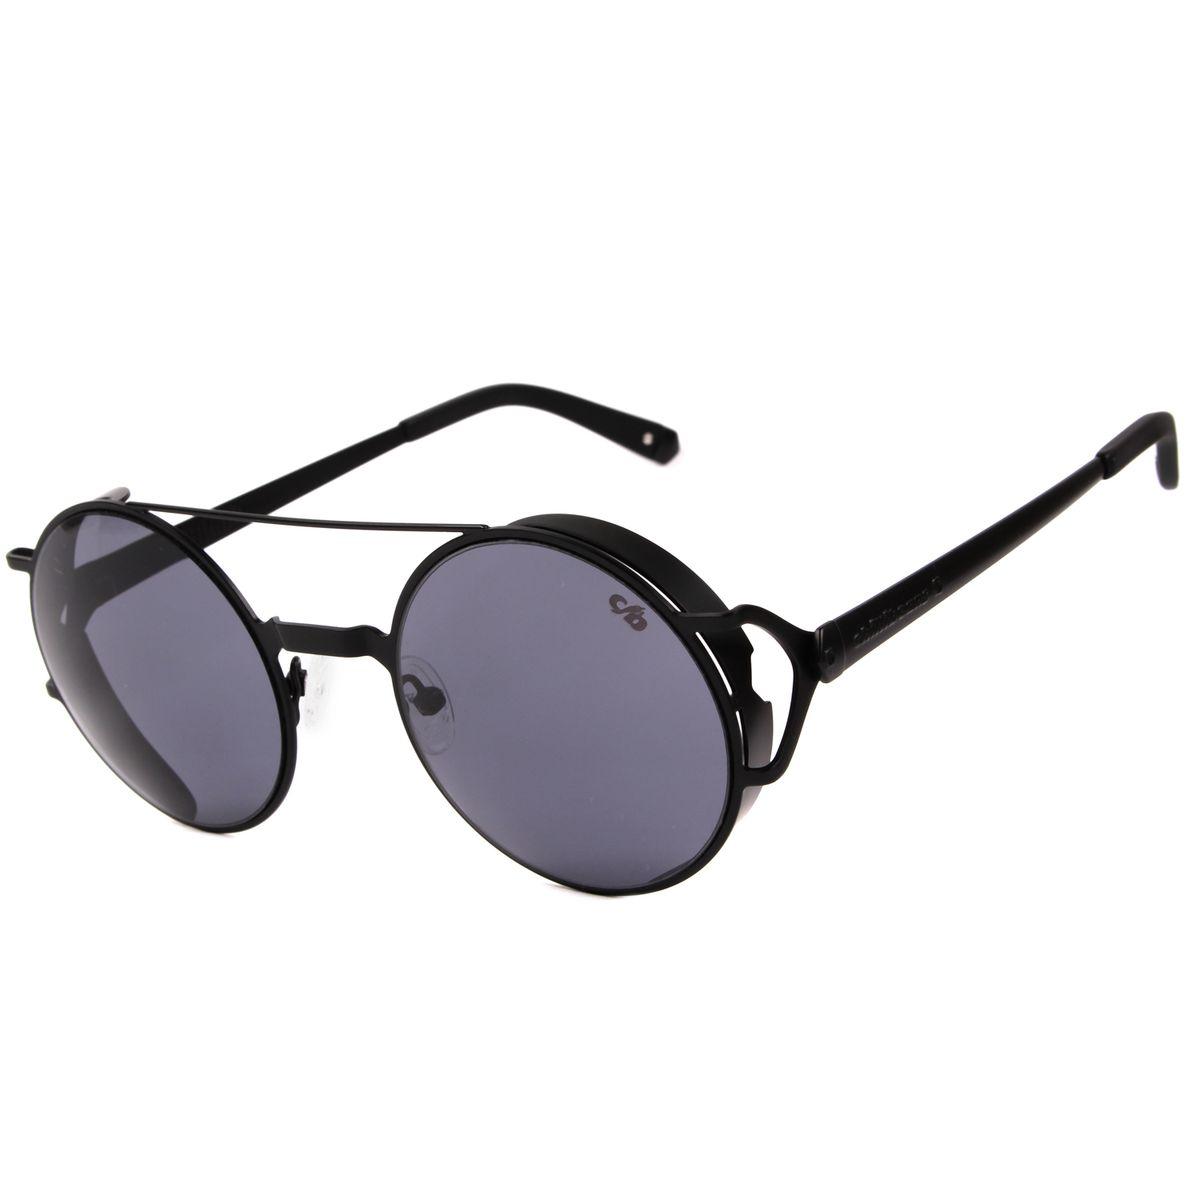 919b670df Óculos de Sol Unissex Alok Preto 2295 - Chilli Beans